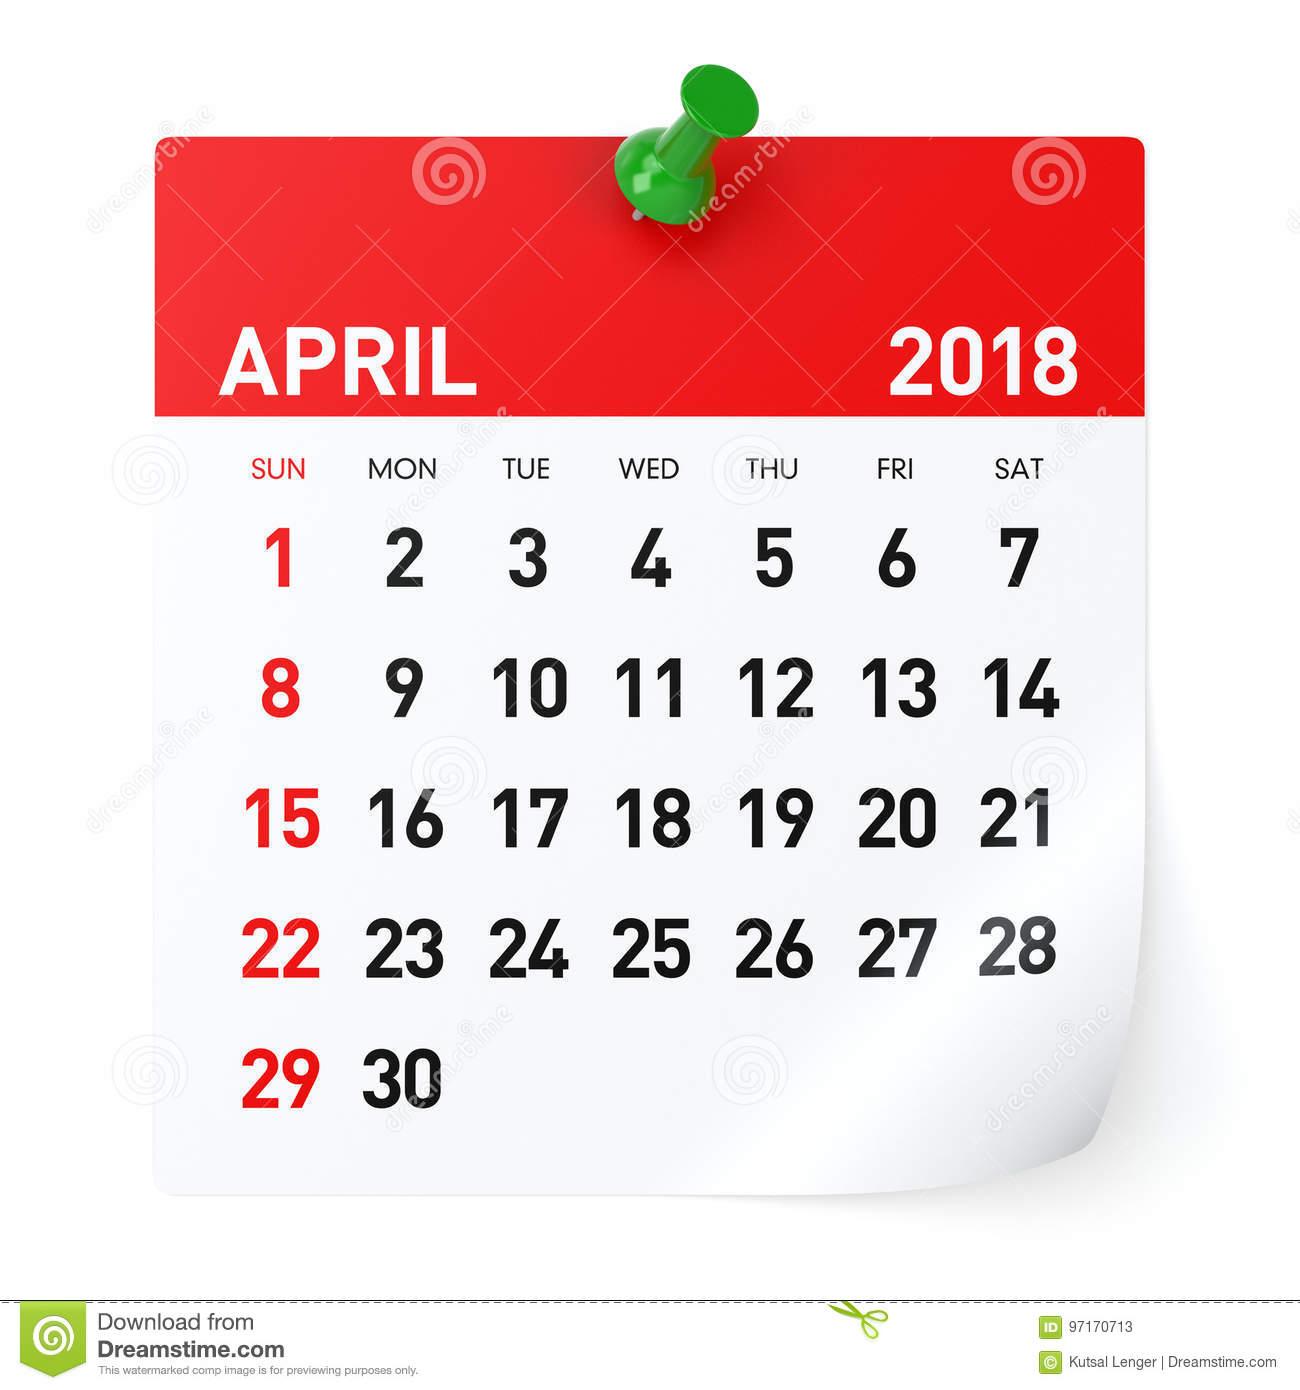 Clipart calendar april 28th. X making the web